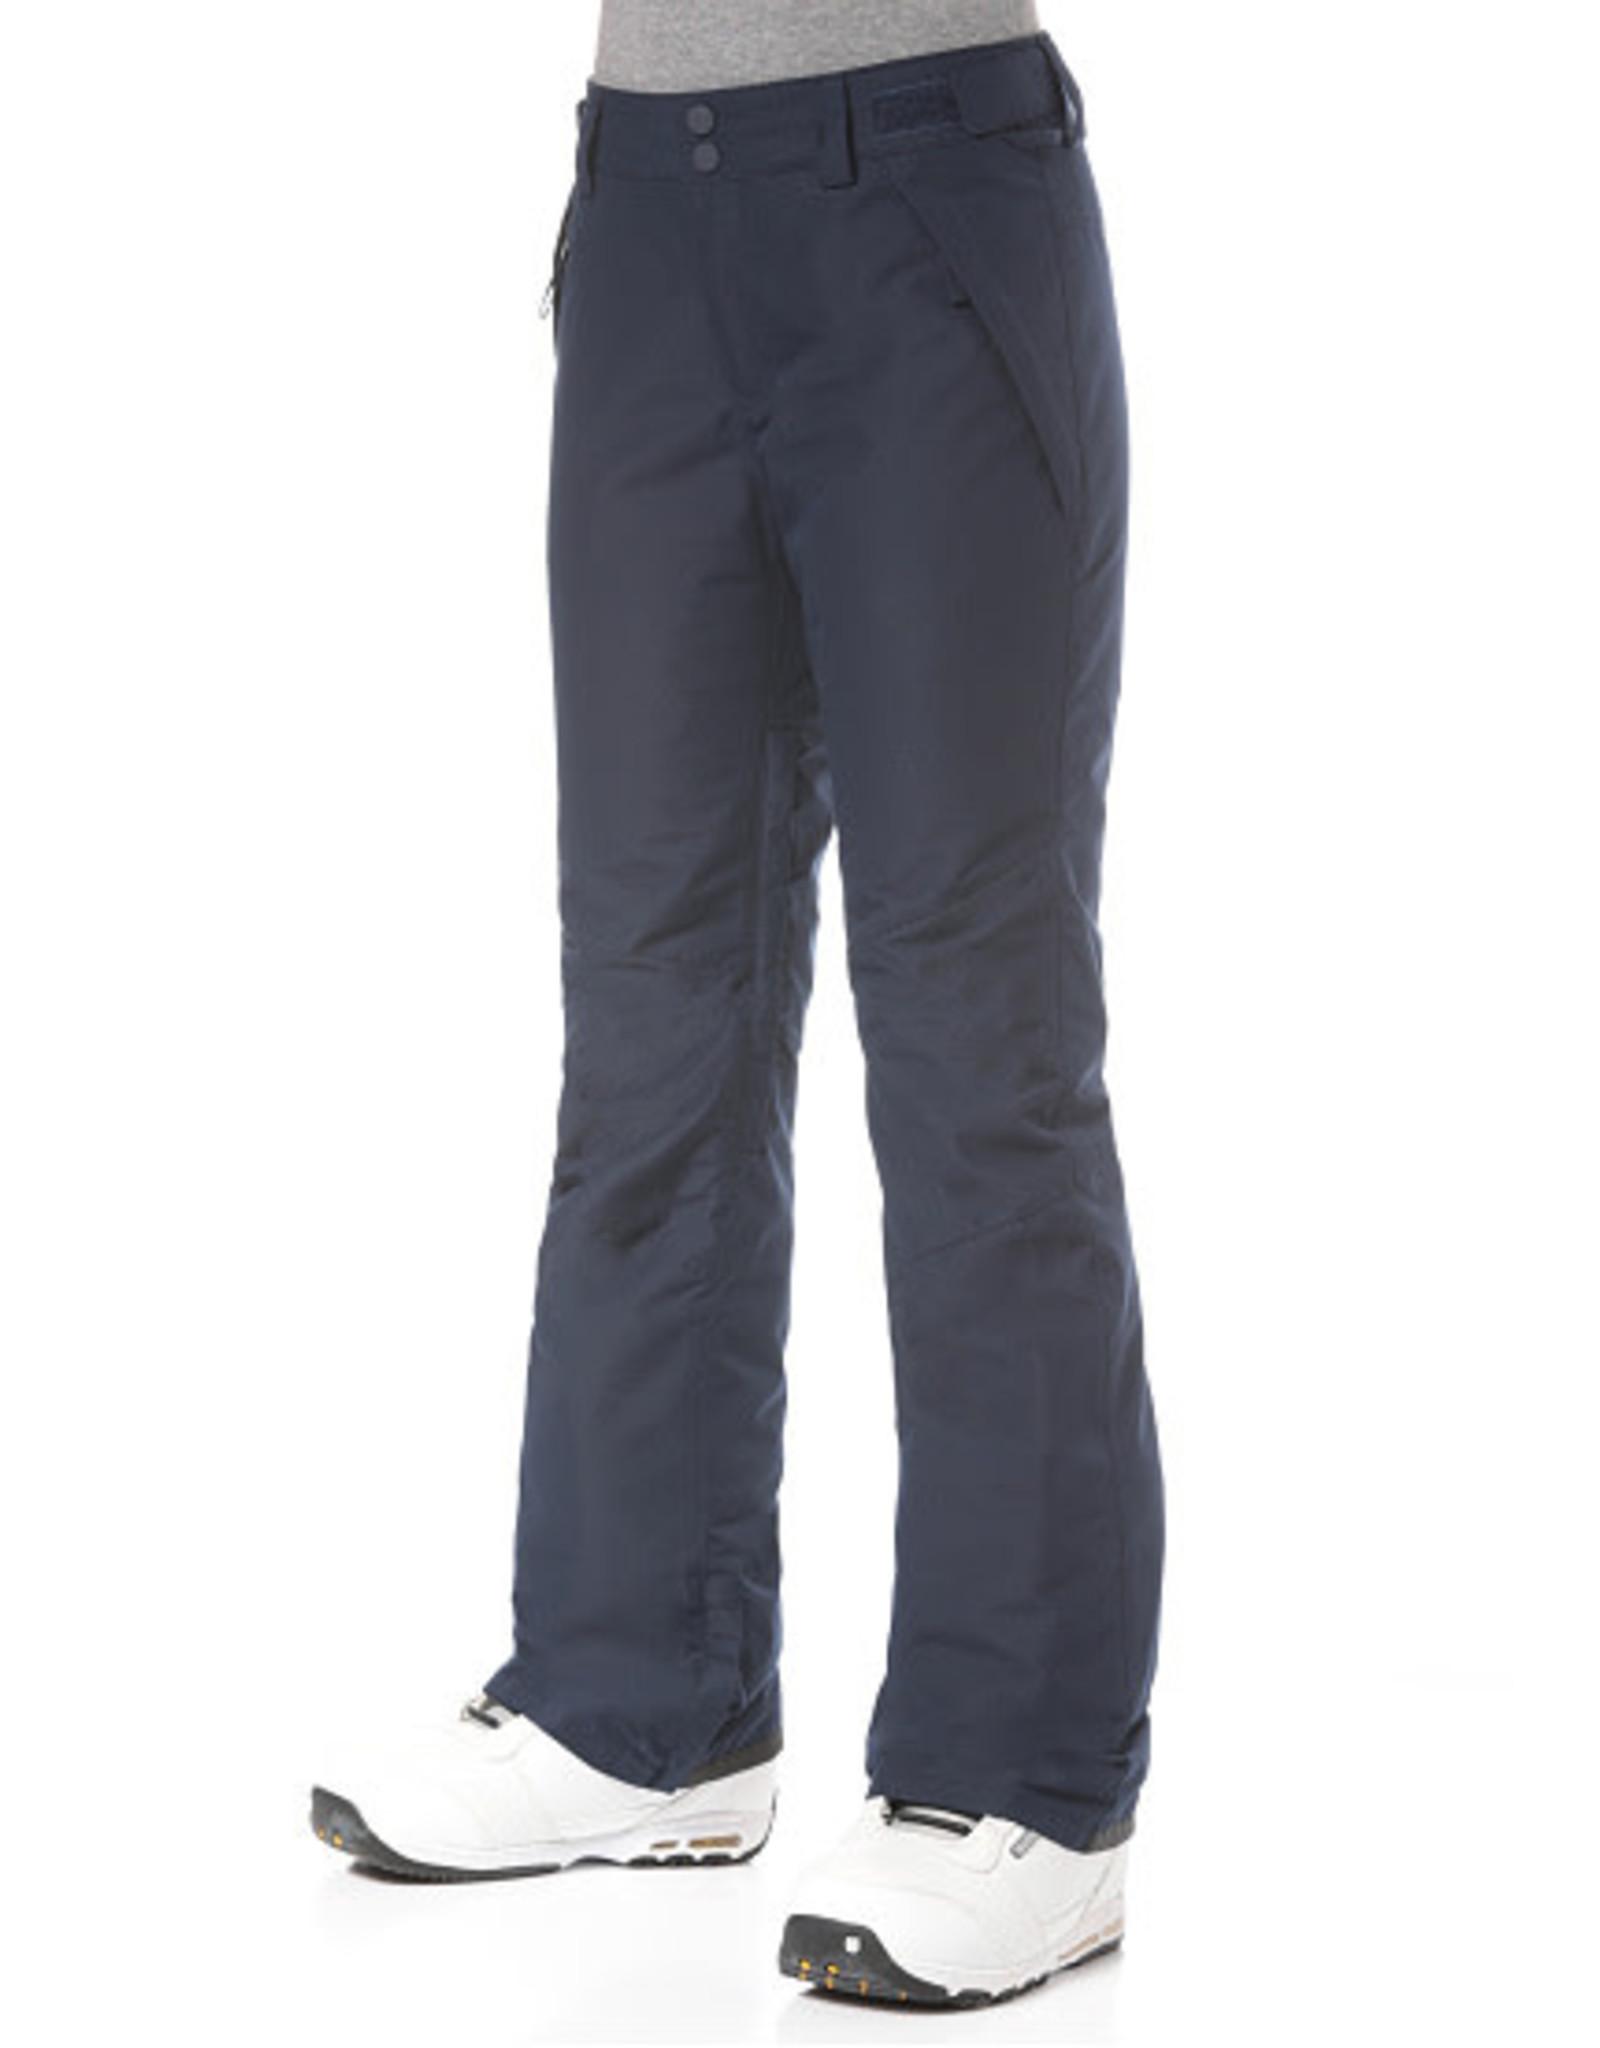 billabong Billabong - pantalon snowboard malla ins